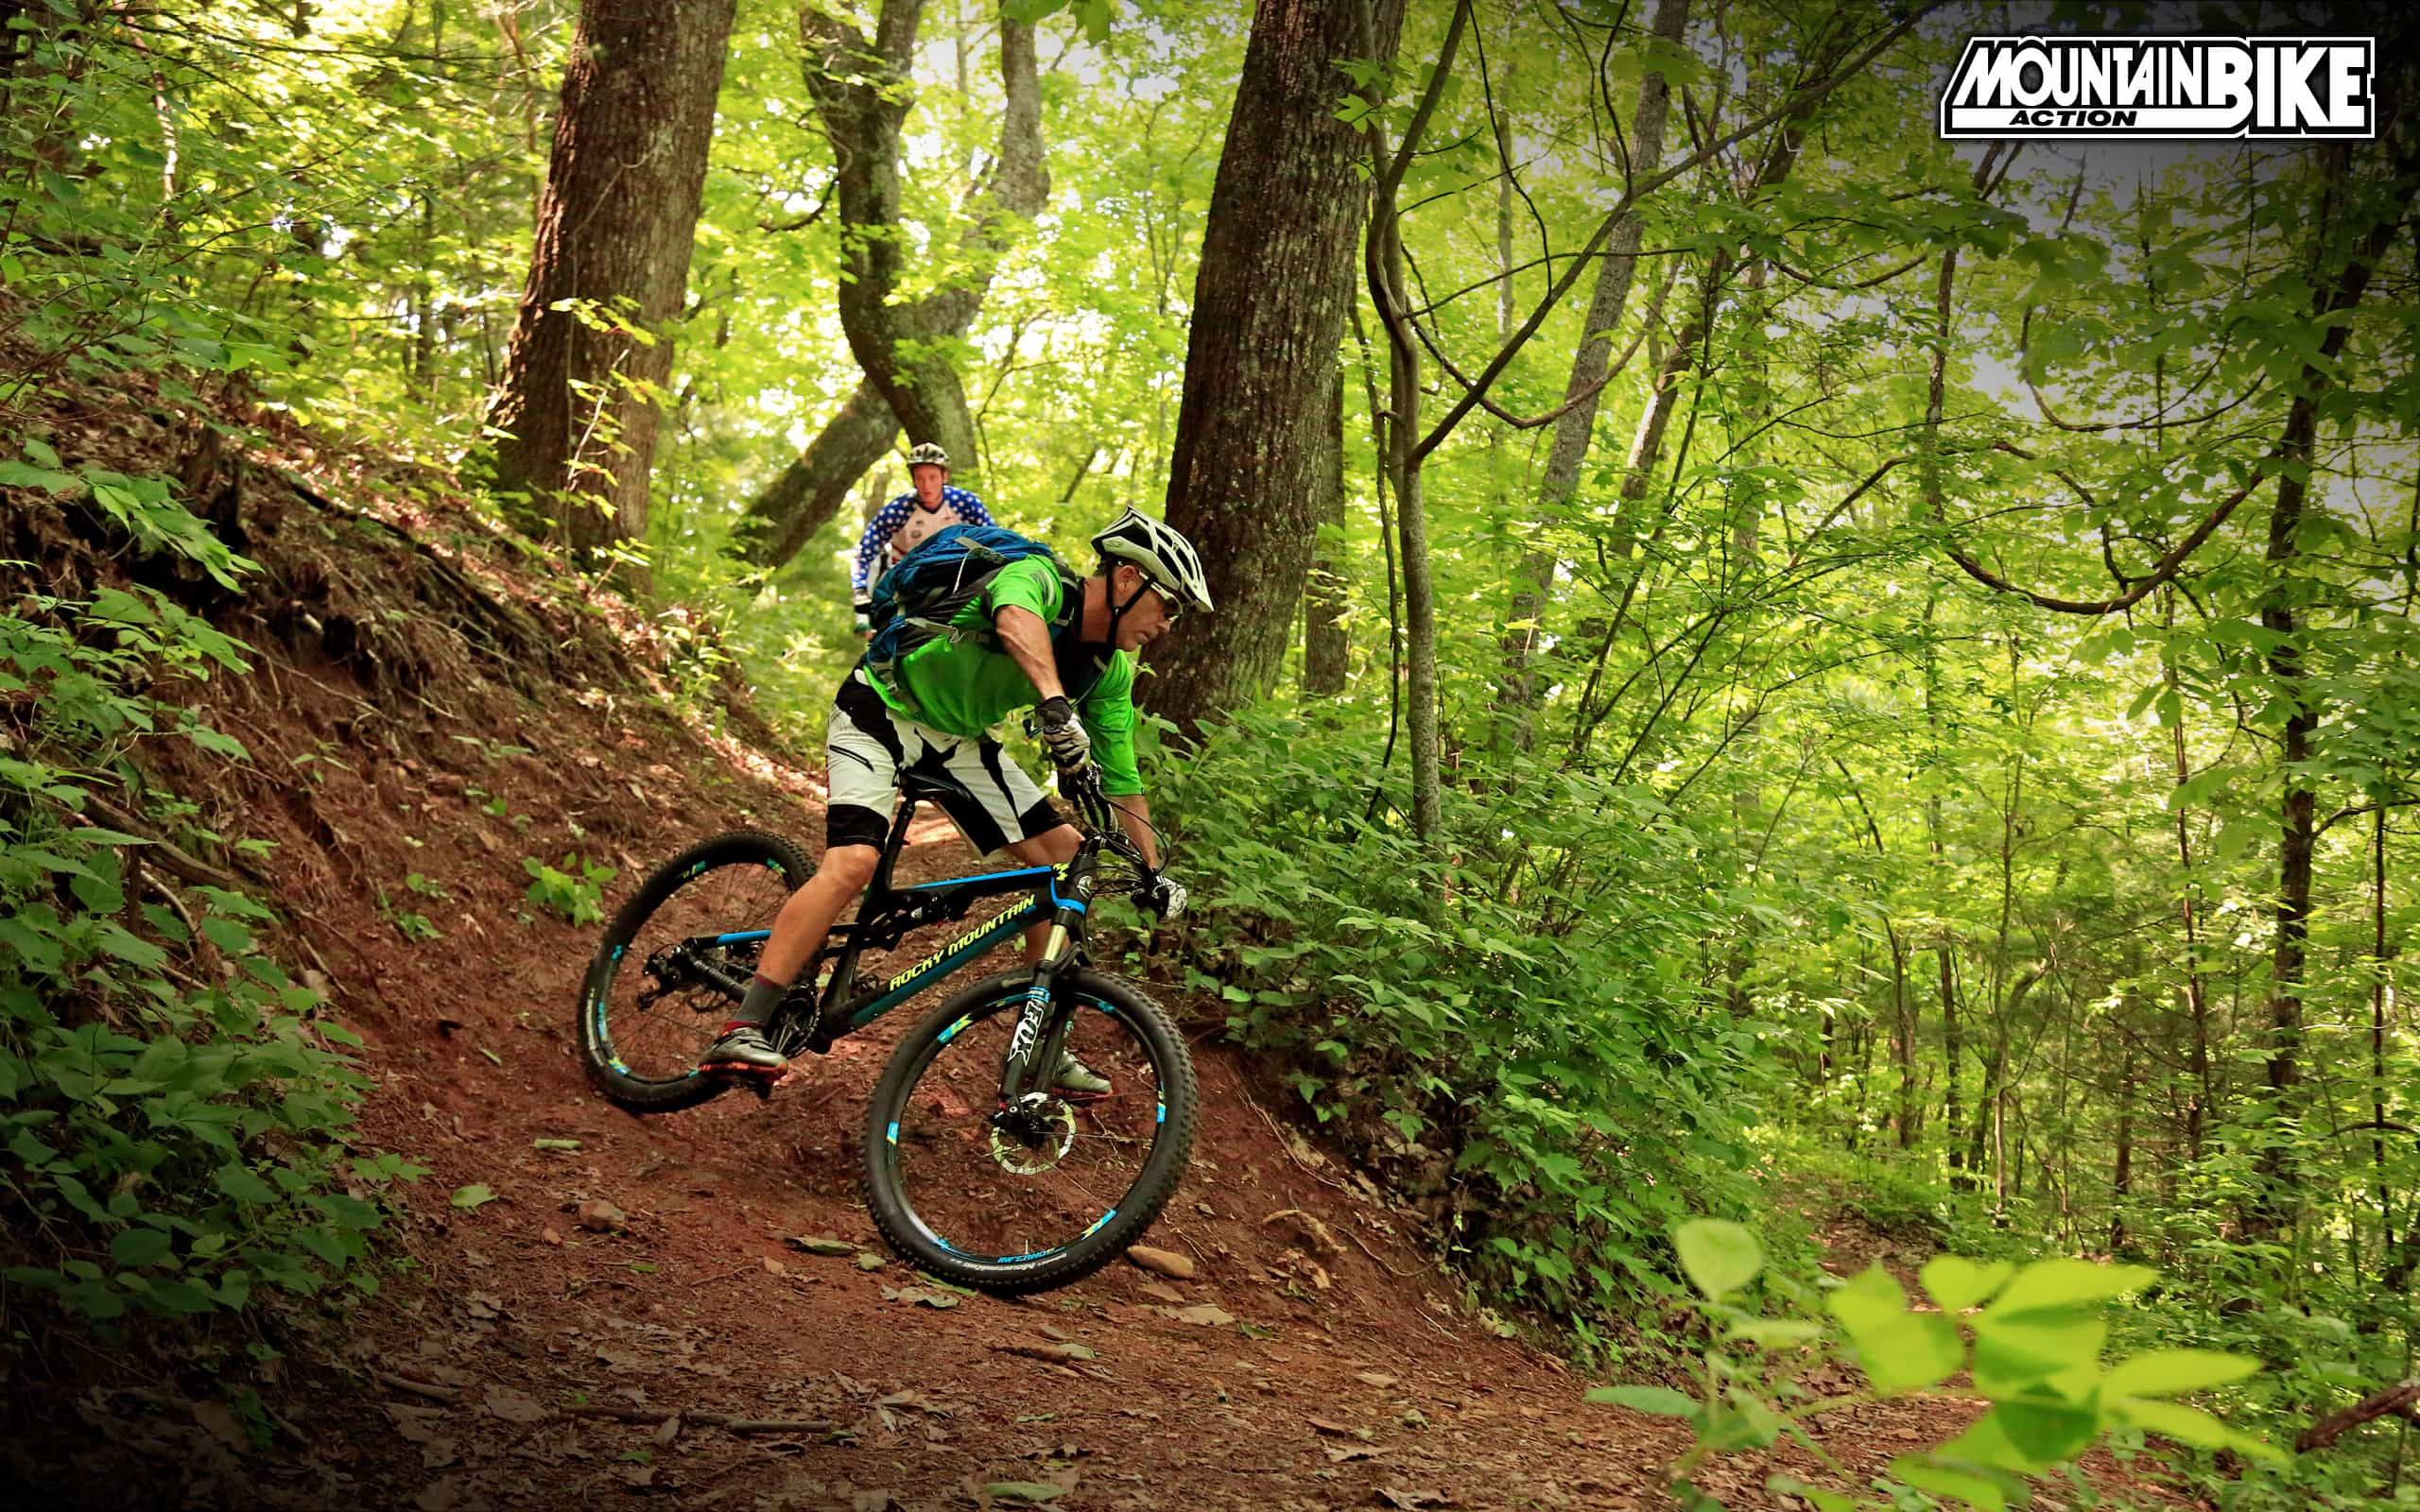 August 2014 Free Wallpaper Mountain Bike Action Magazine